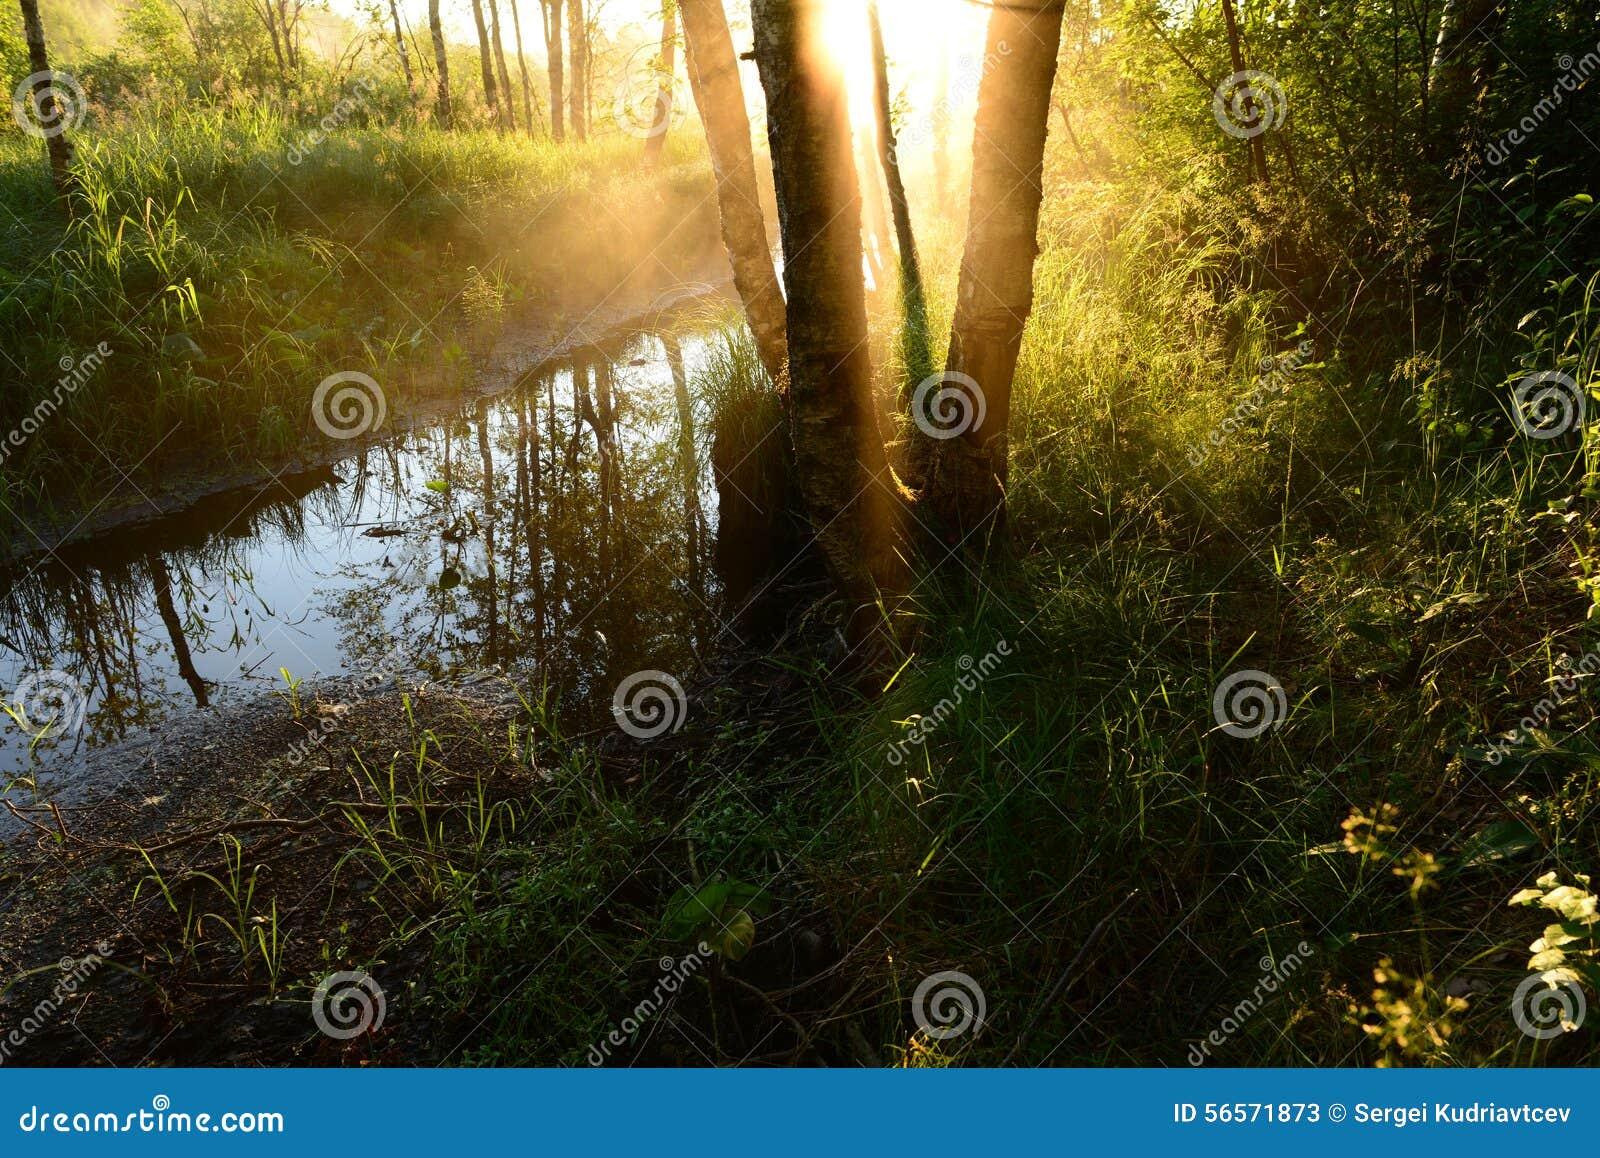 Download Ανατολή μέσω της ομίχλης σε έναν δασικό ποταμό το πρωί αρχών του καλοκαιριού Στοκ Εικόνα - εικόνα από χρώμα, γραφικός: 56571873